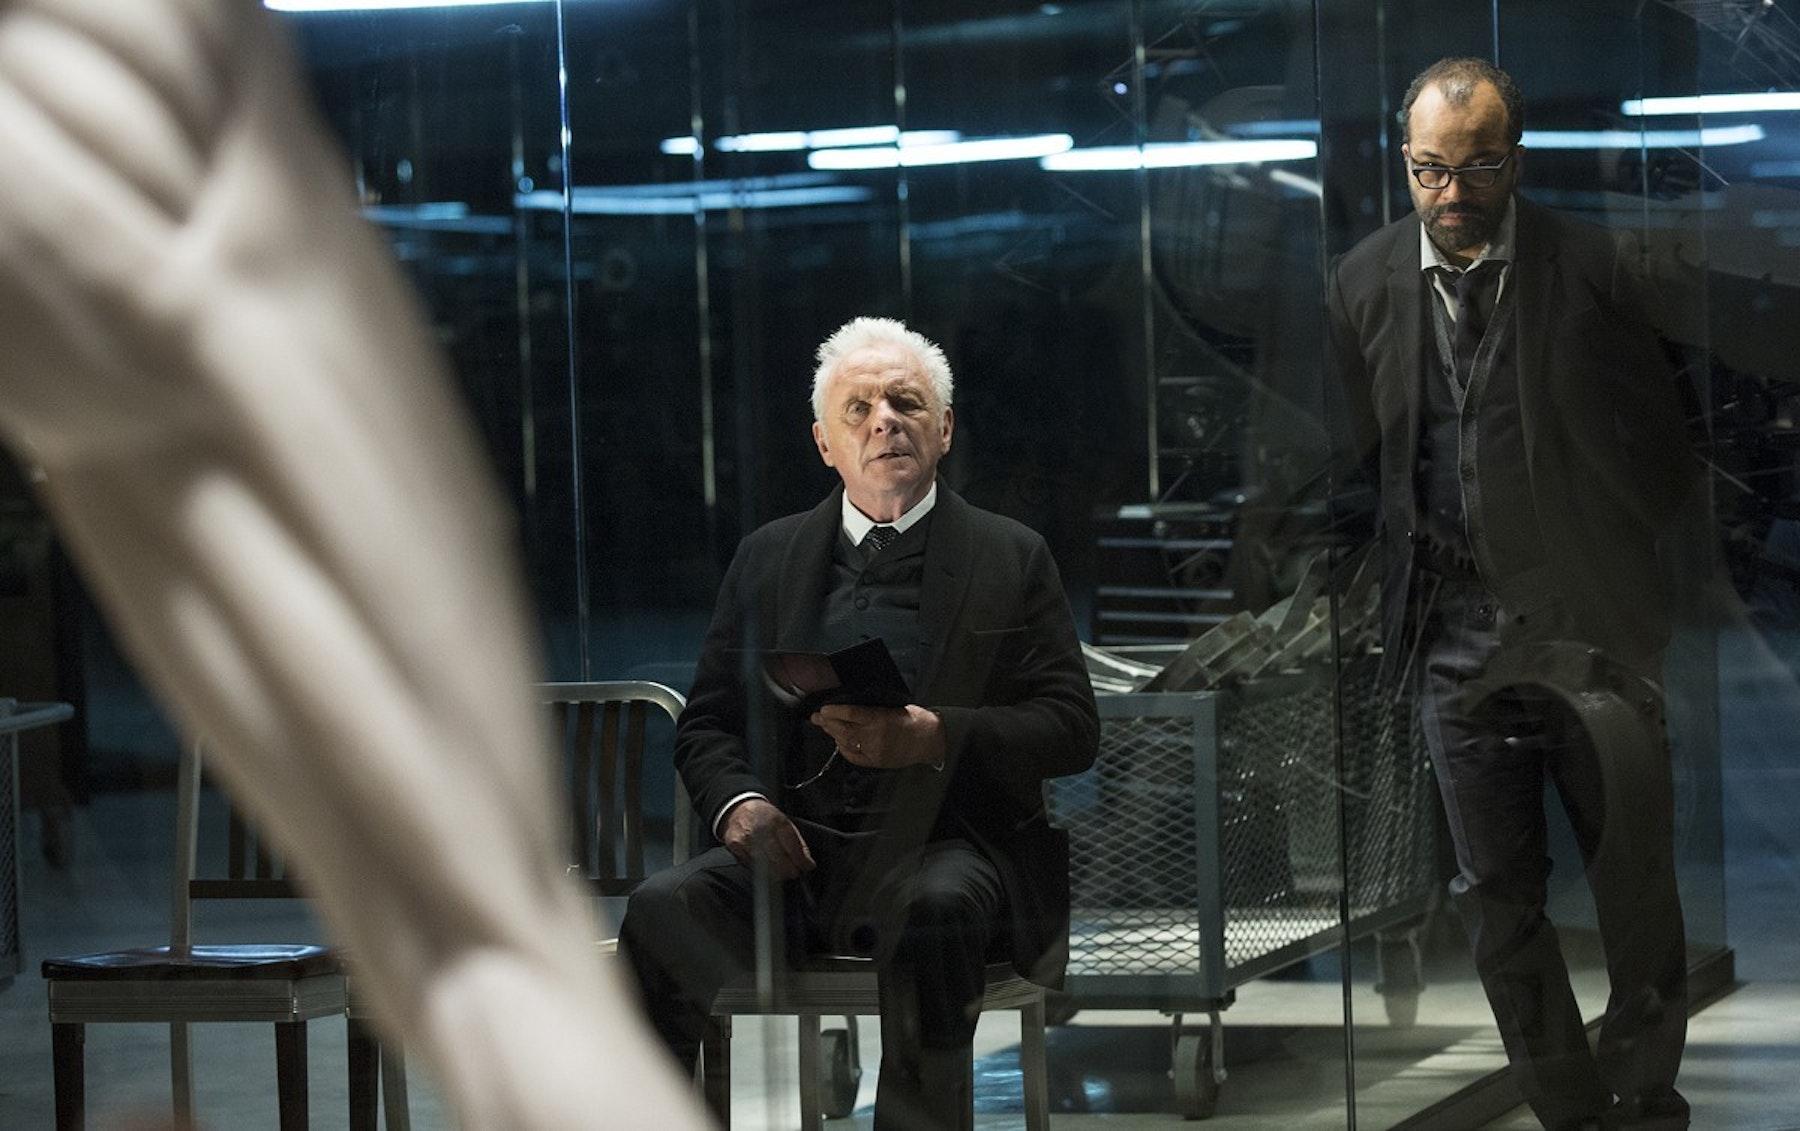 Anthony Hopkins as Dr. Robert Ford andJeffrey Wright as Bernard Lowe staring at...something.